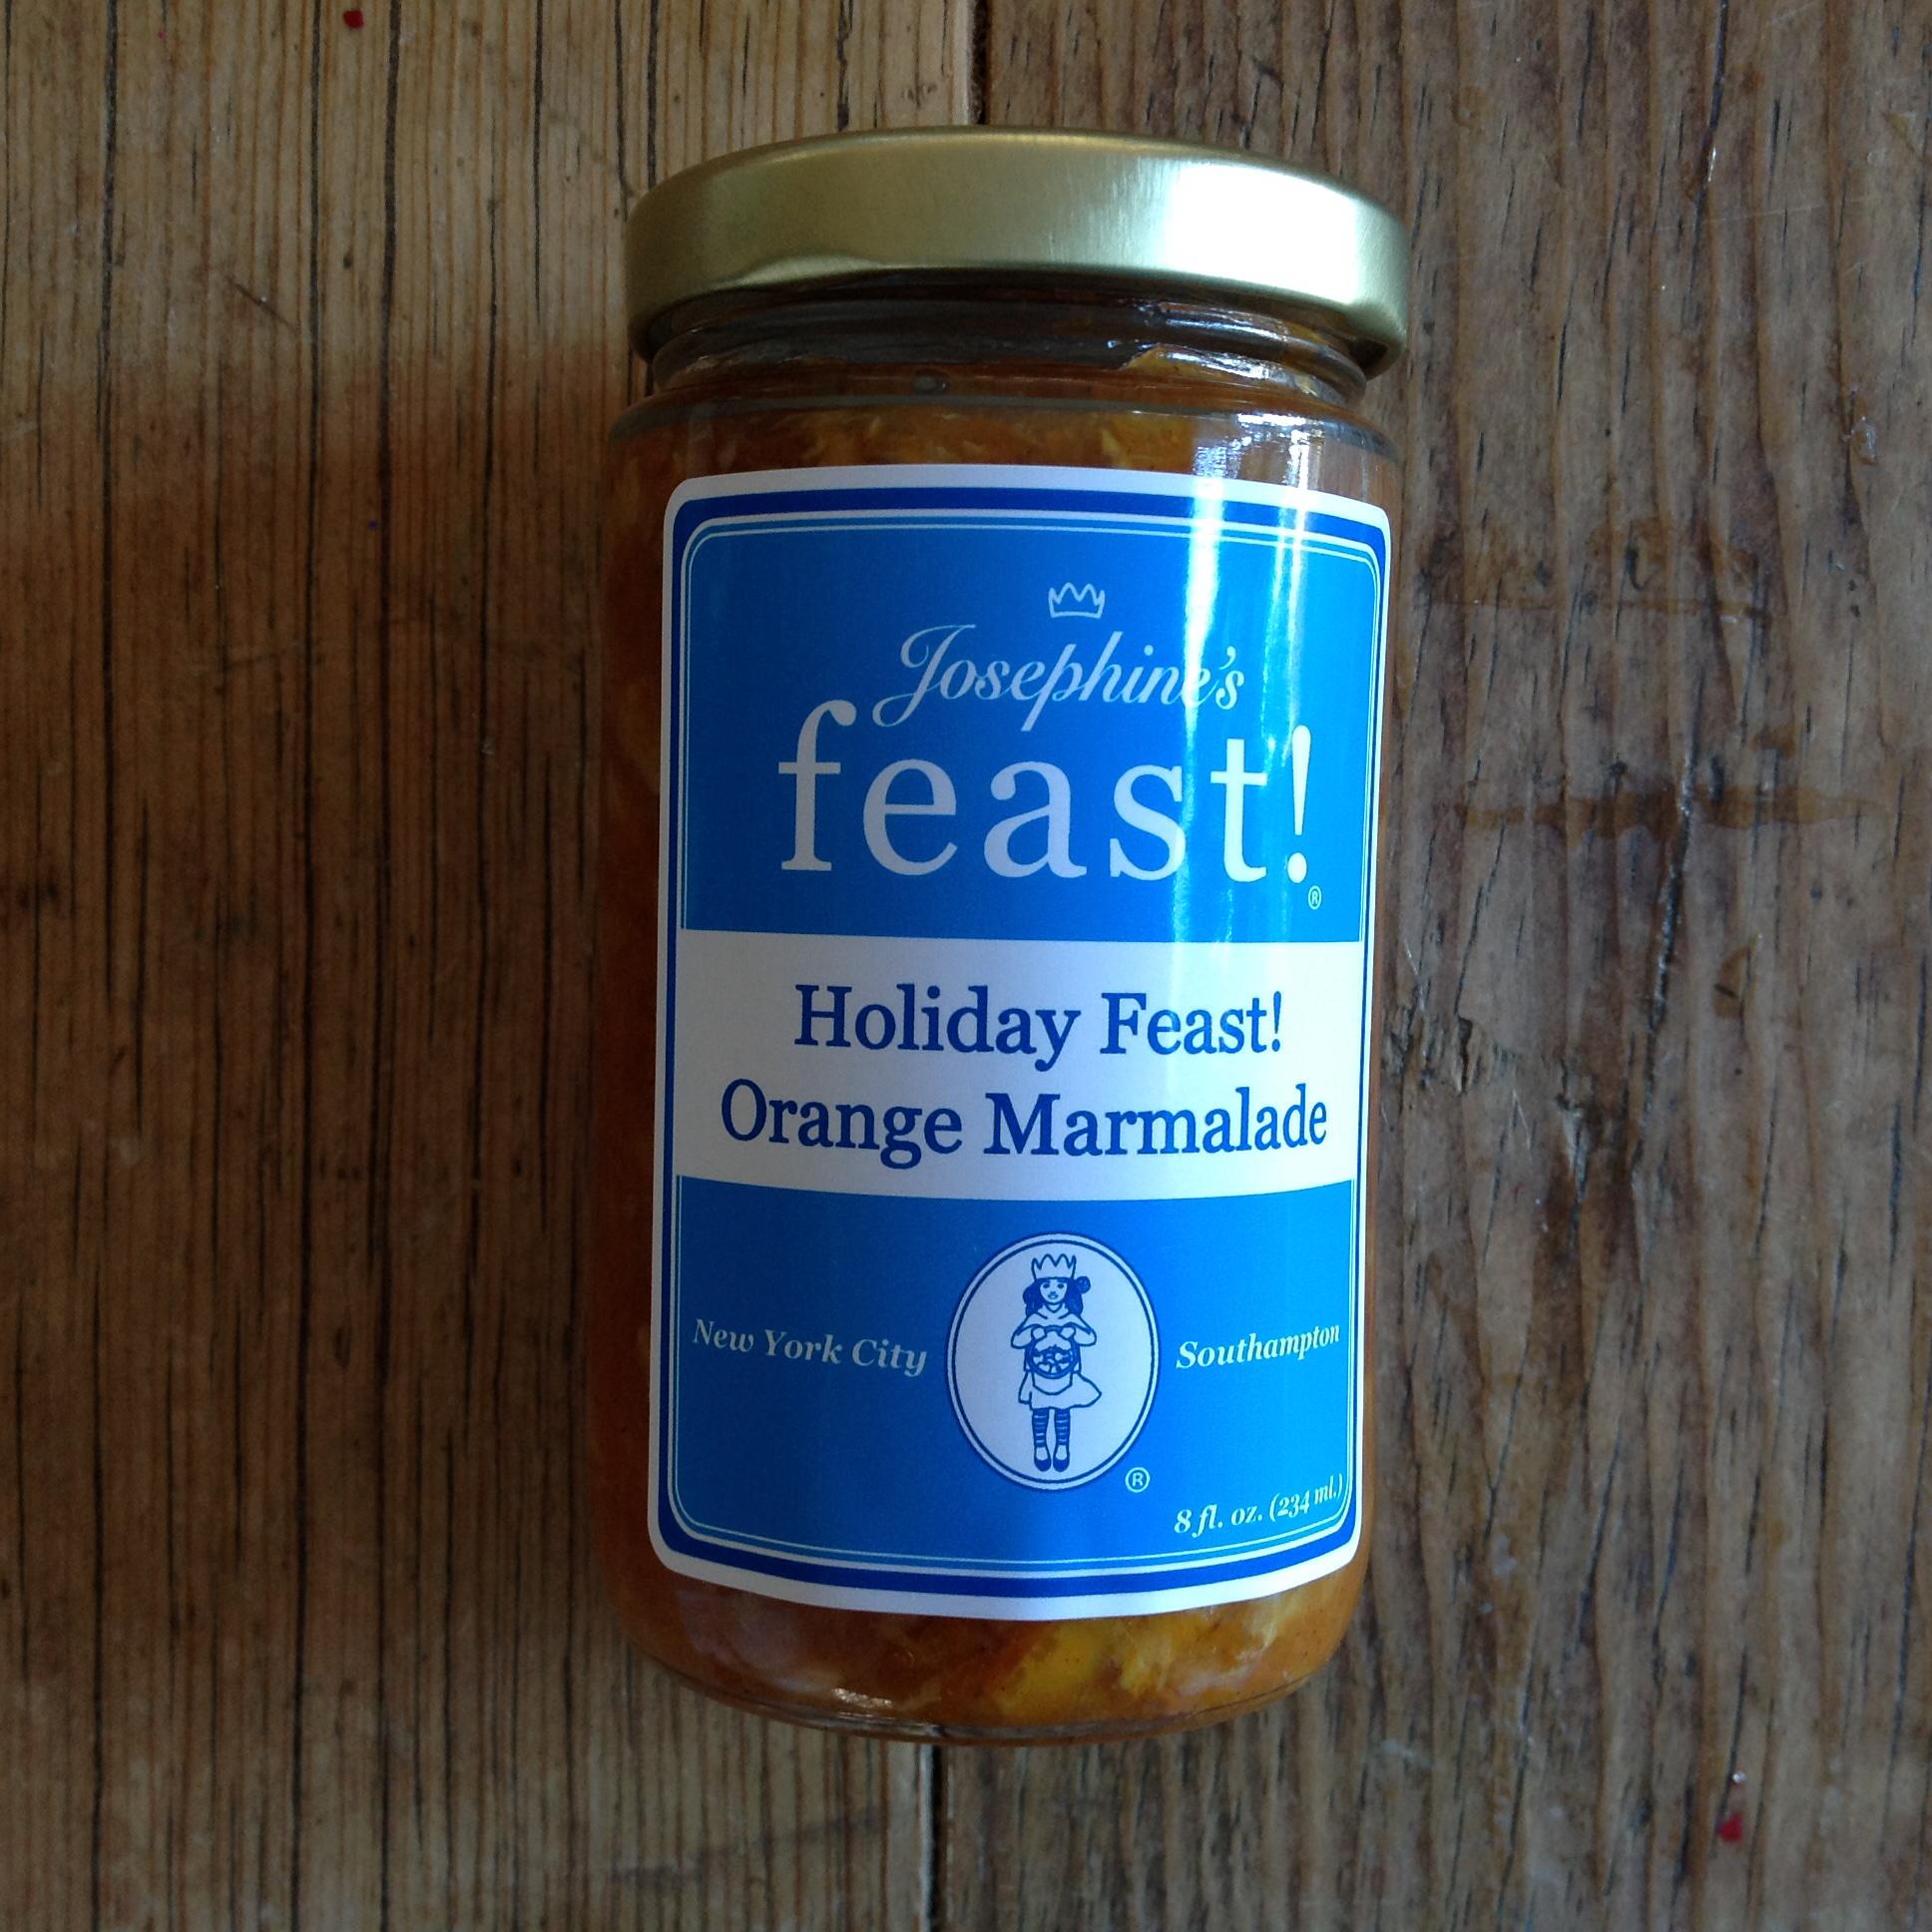 Holiday Feast! Orange Marmalade 100011